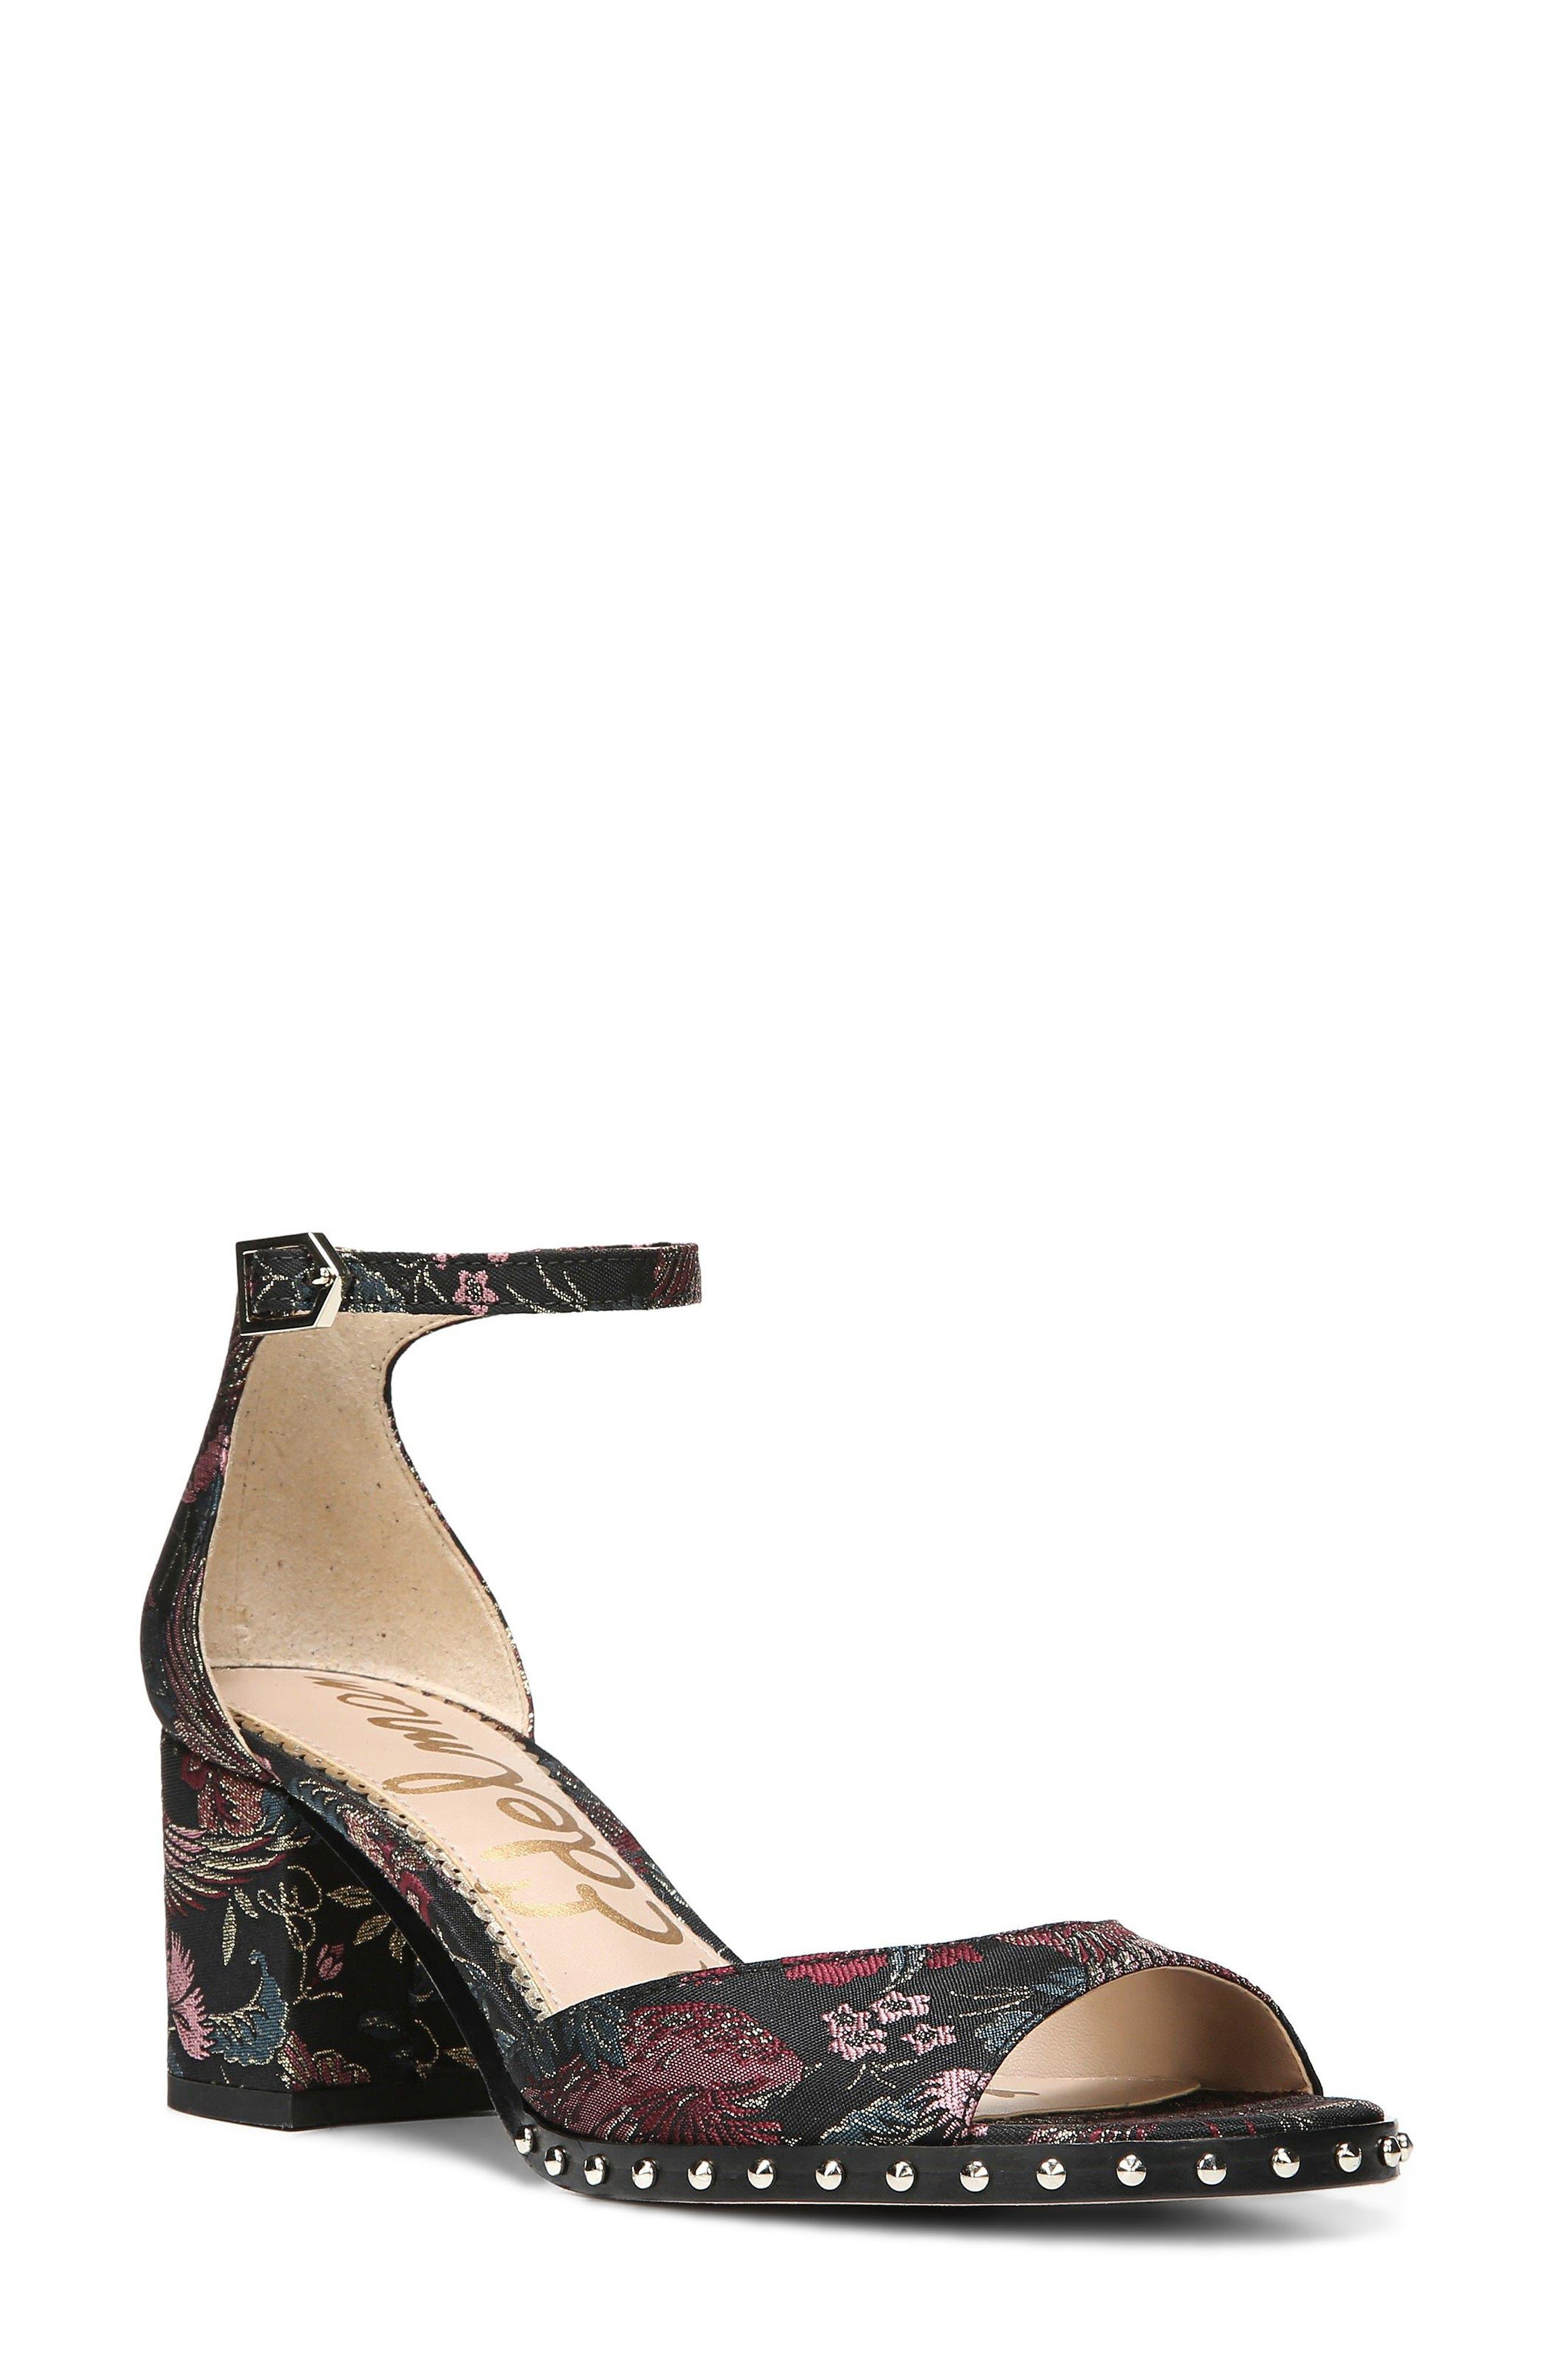 Main Image - Sam Edelman Susie Ankle Strap Sandal (Women)